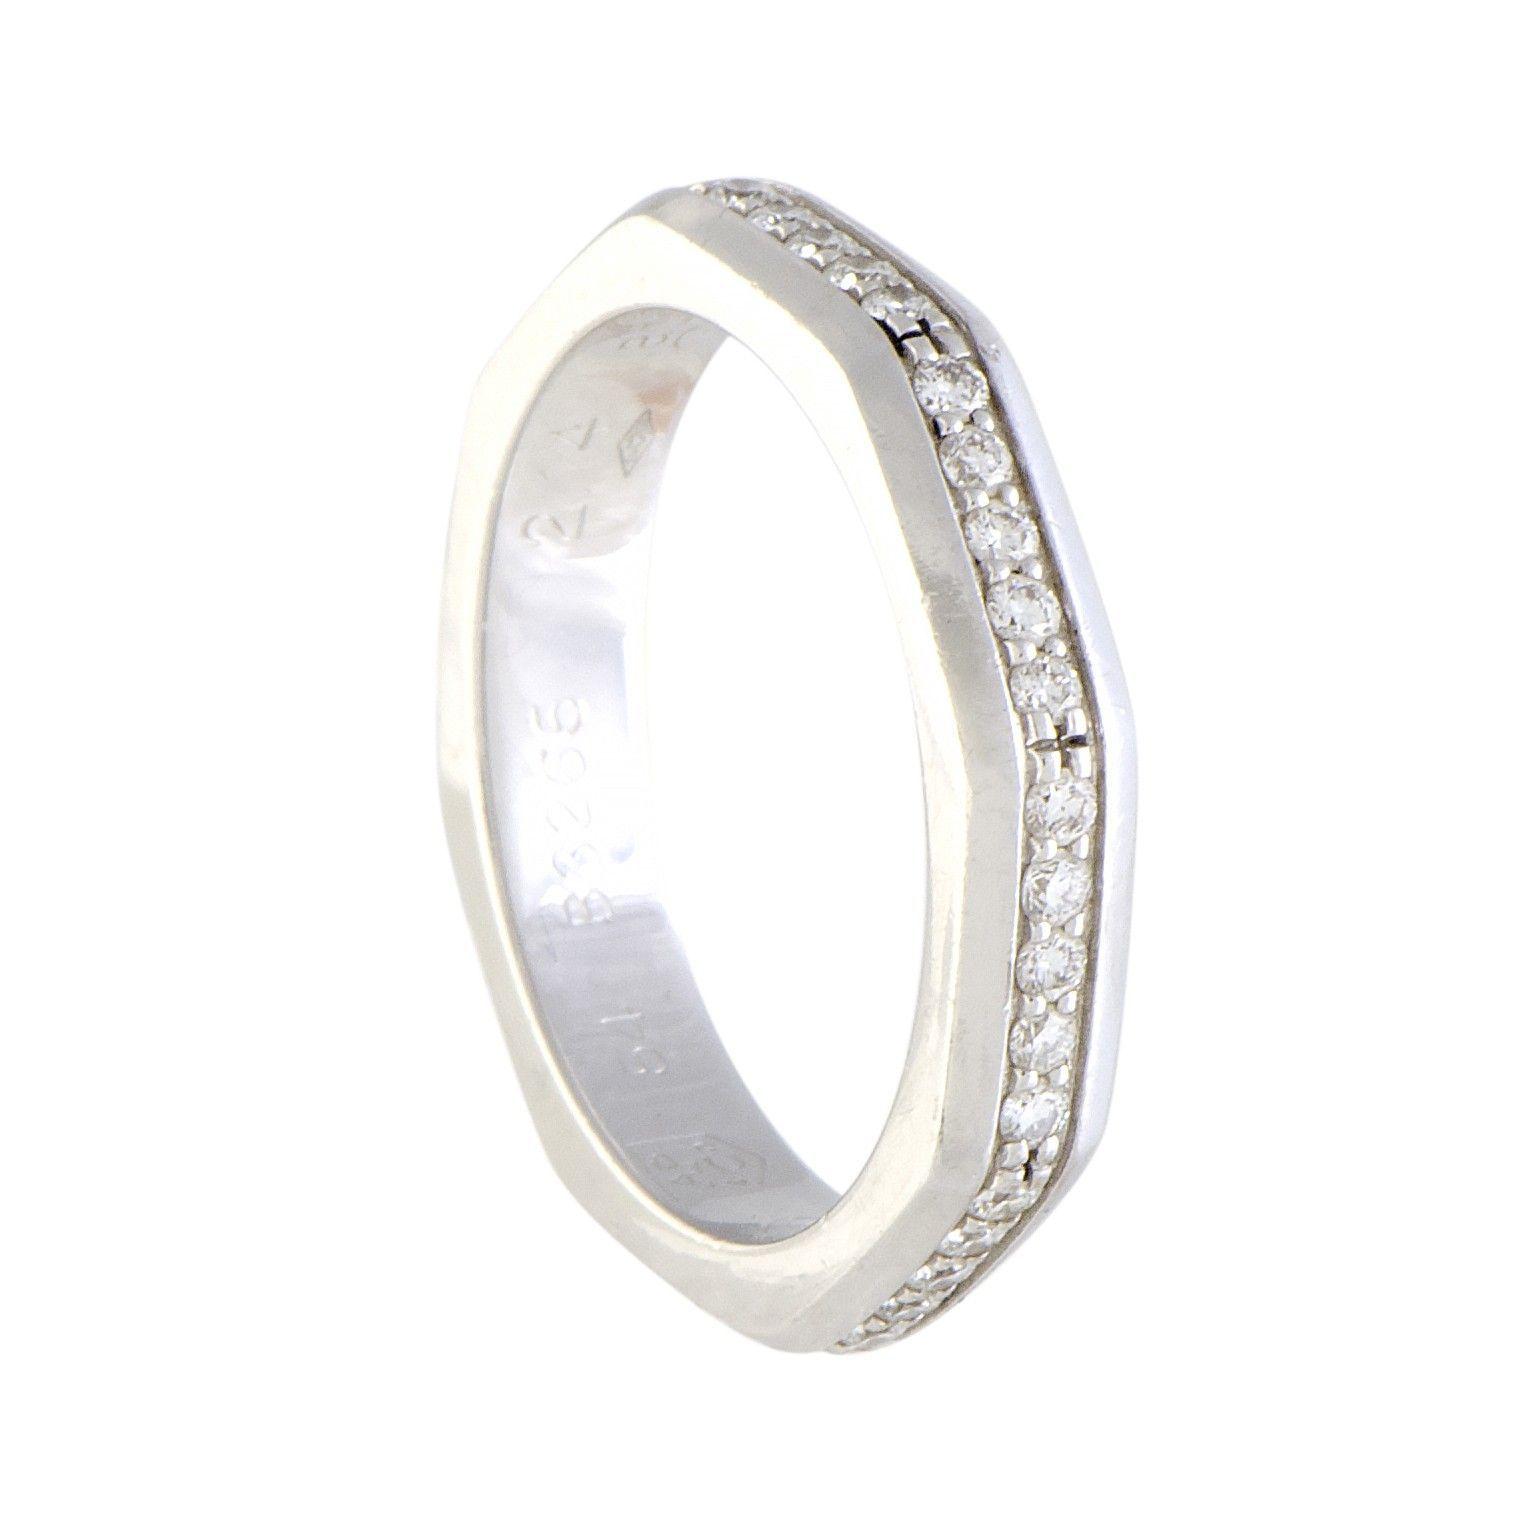 Audemars Piguet Royal Oak 18k White Gold Diamond Pave Eternity Band Ring